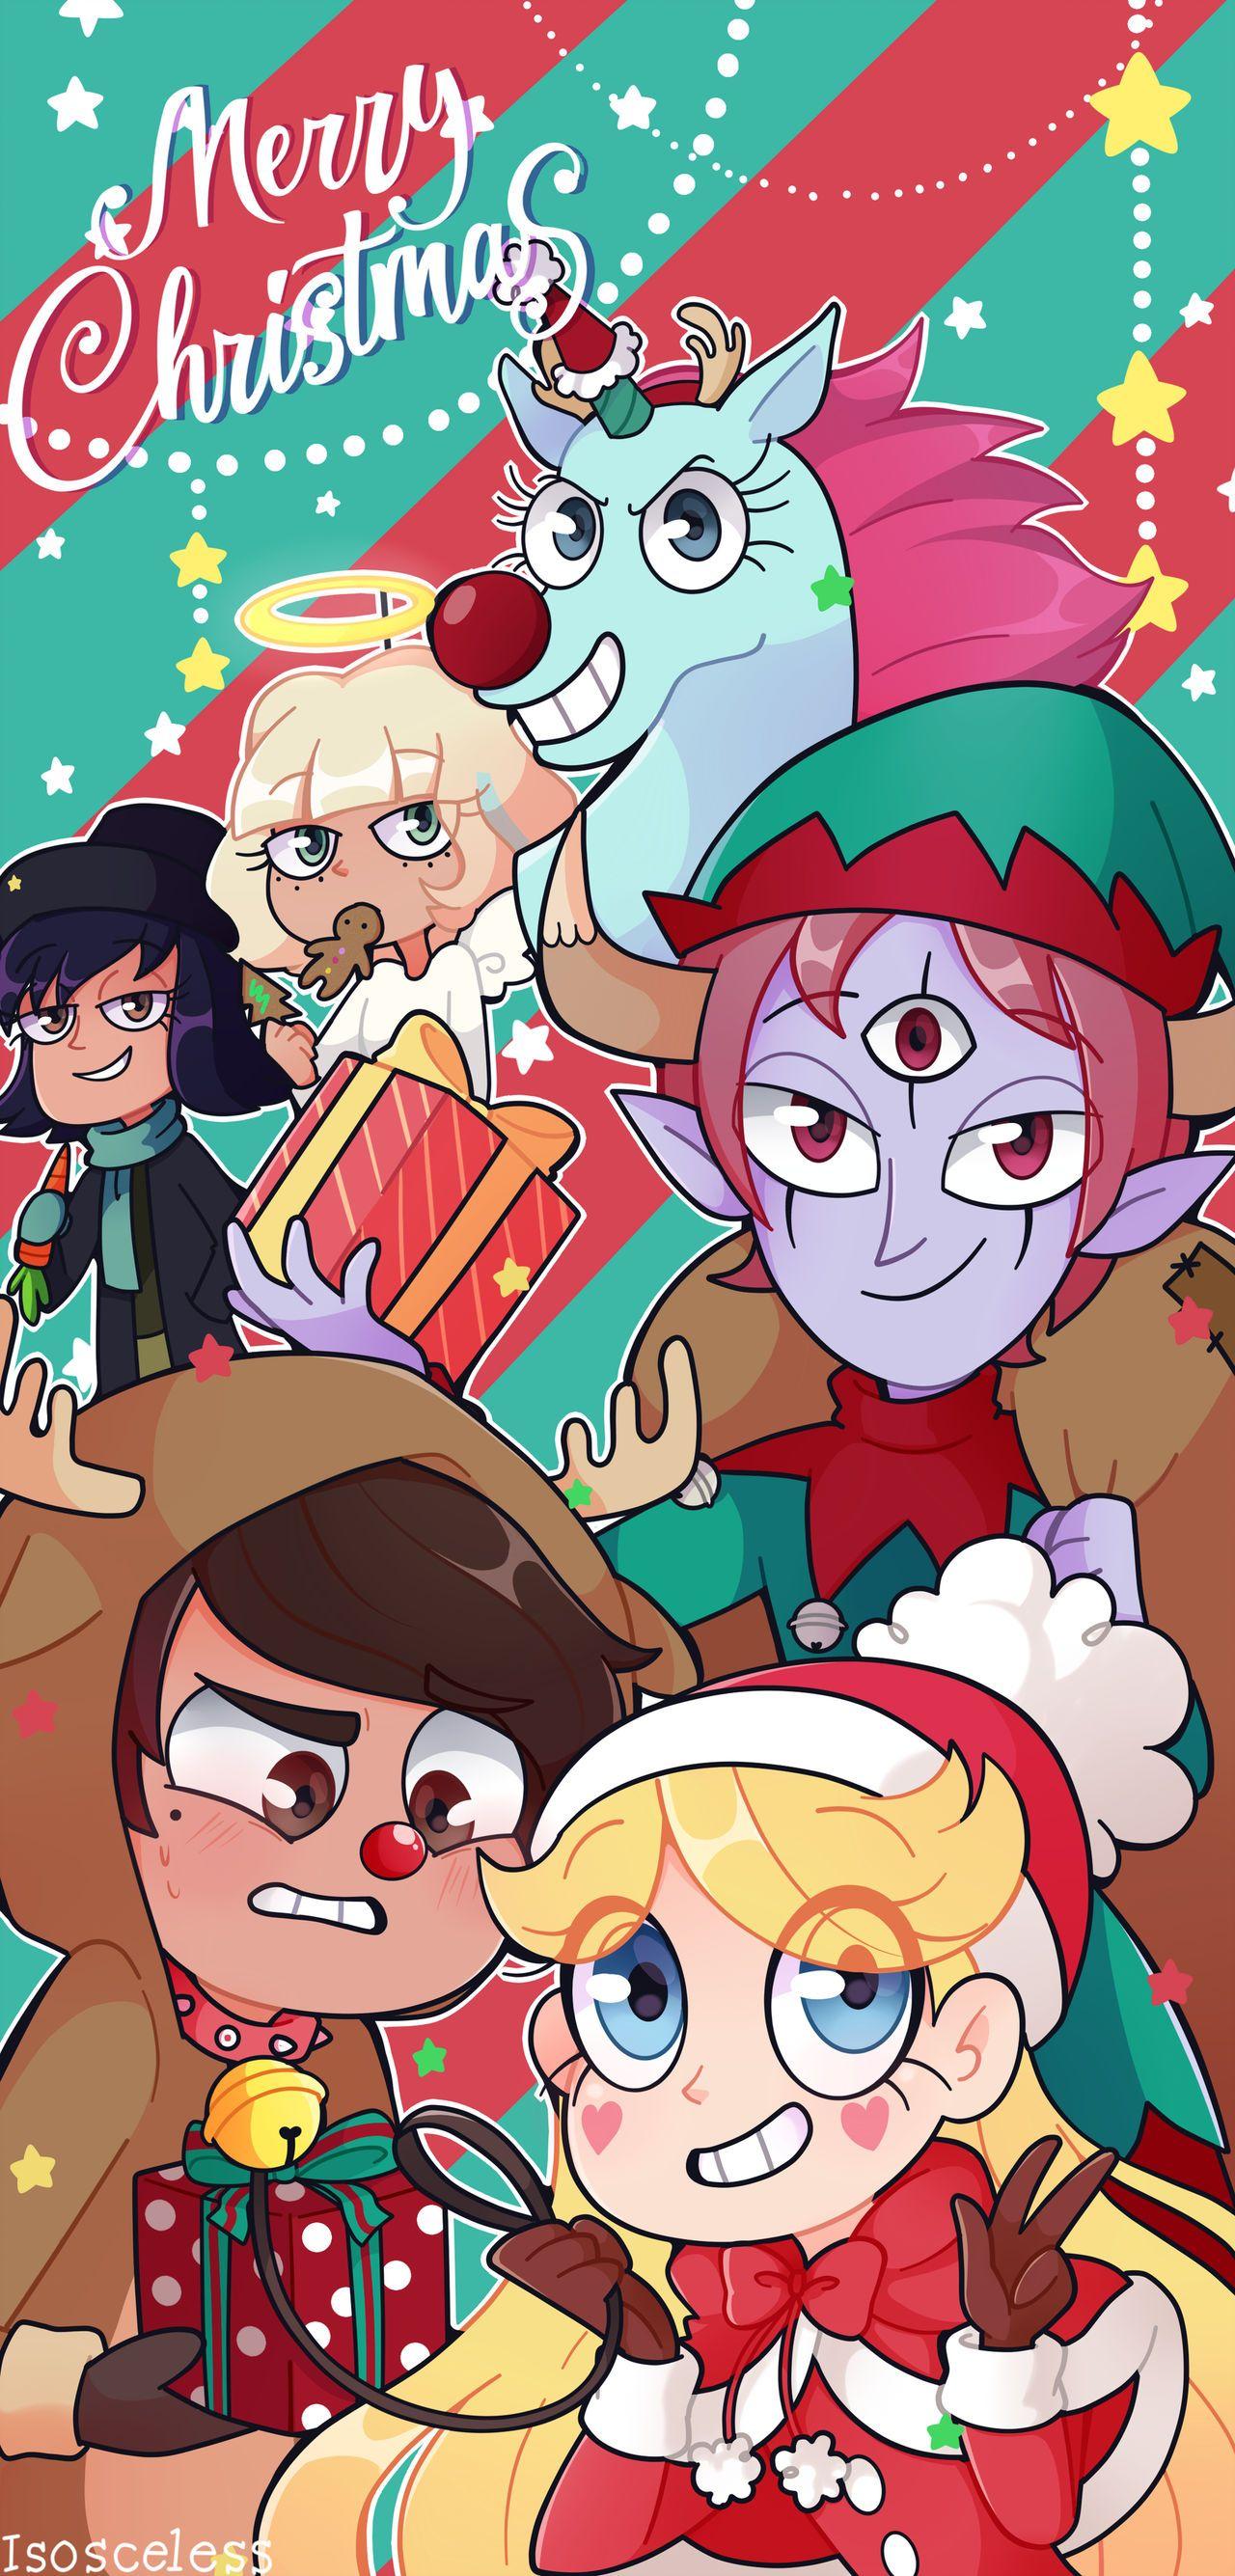 Evil Christmas Characters.Svtfoe Christmas Speedpaint By Isosceless Starco Star